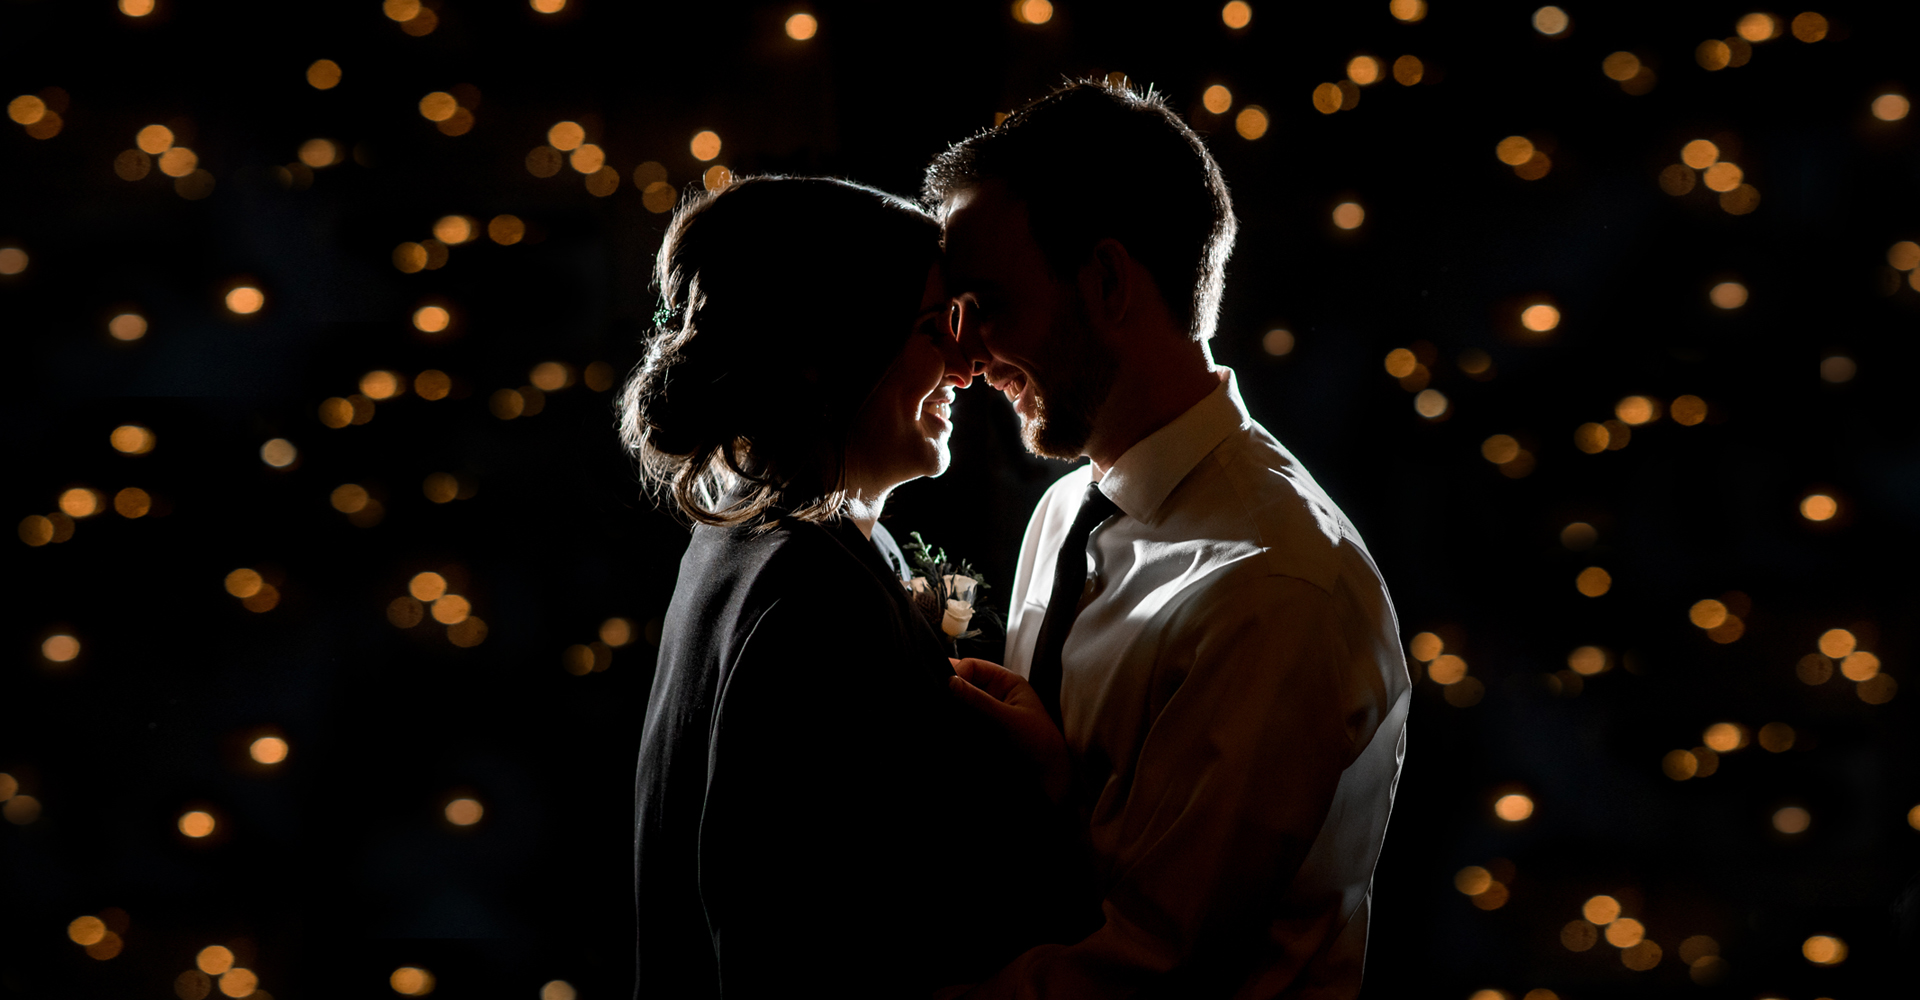 Destination wedding photographer in Colorado